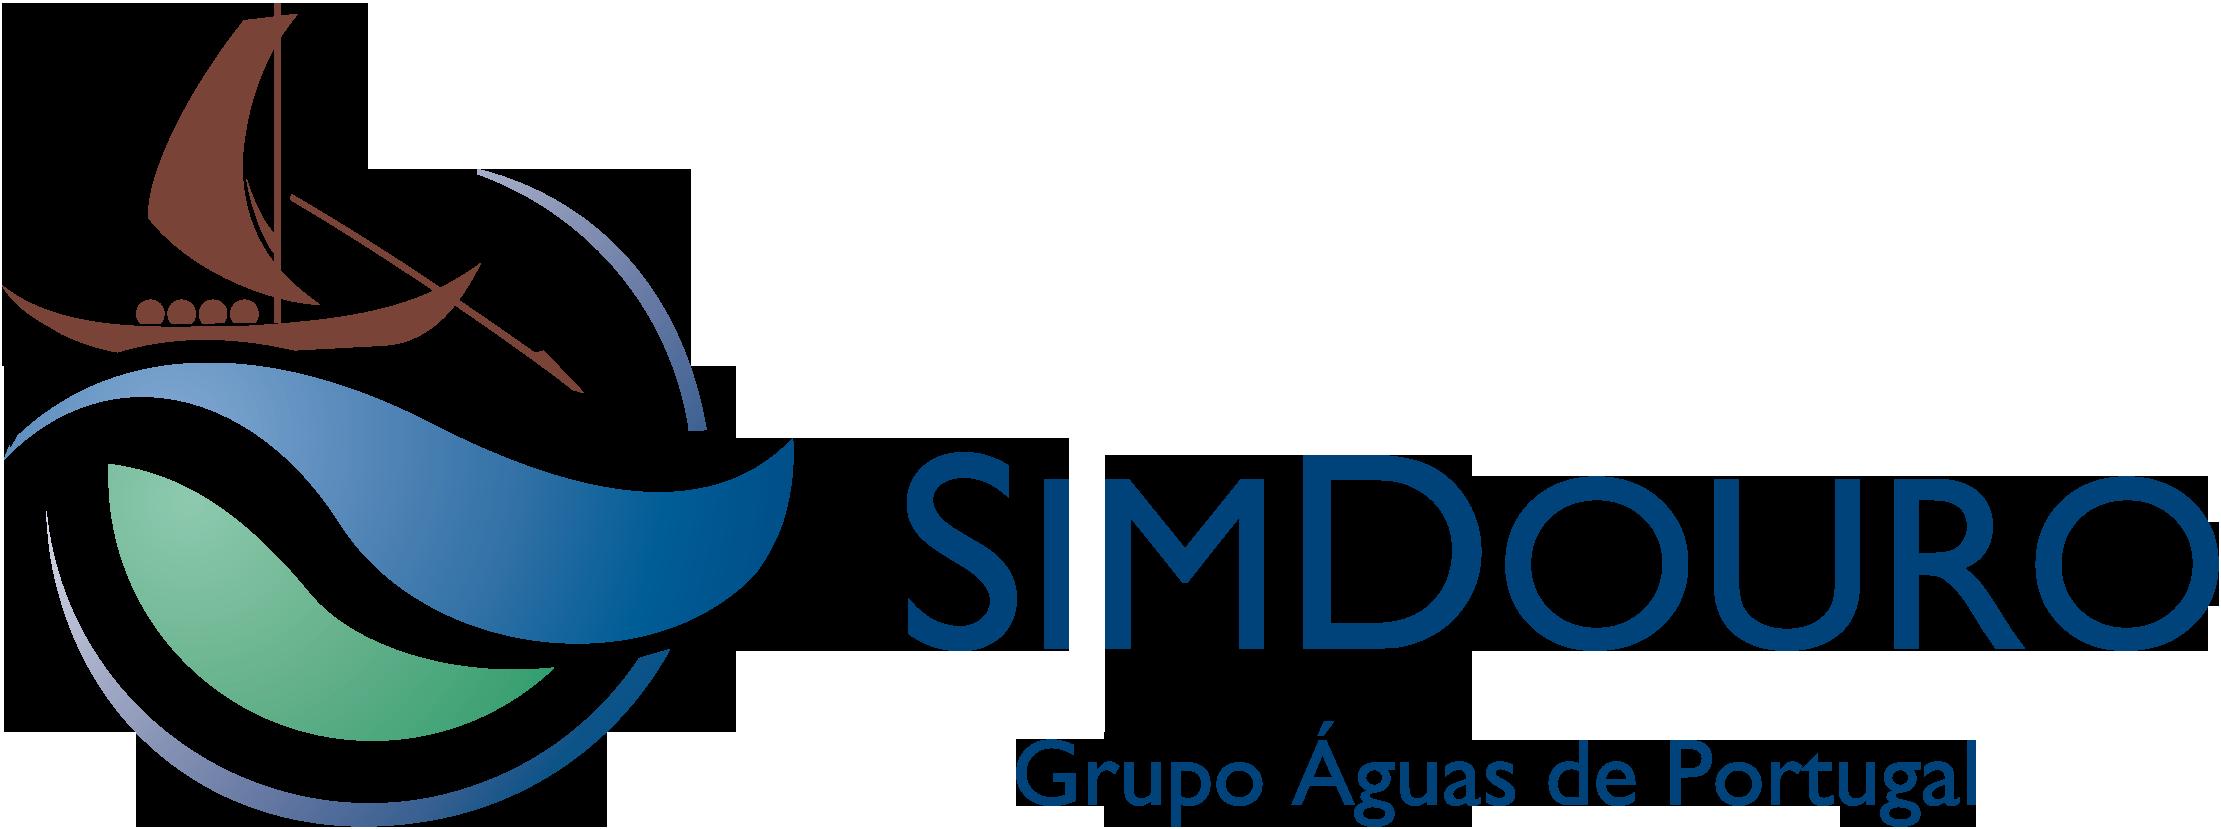 SimDouro